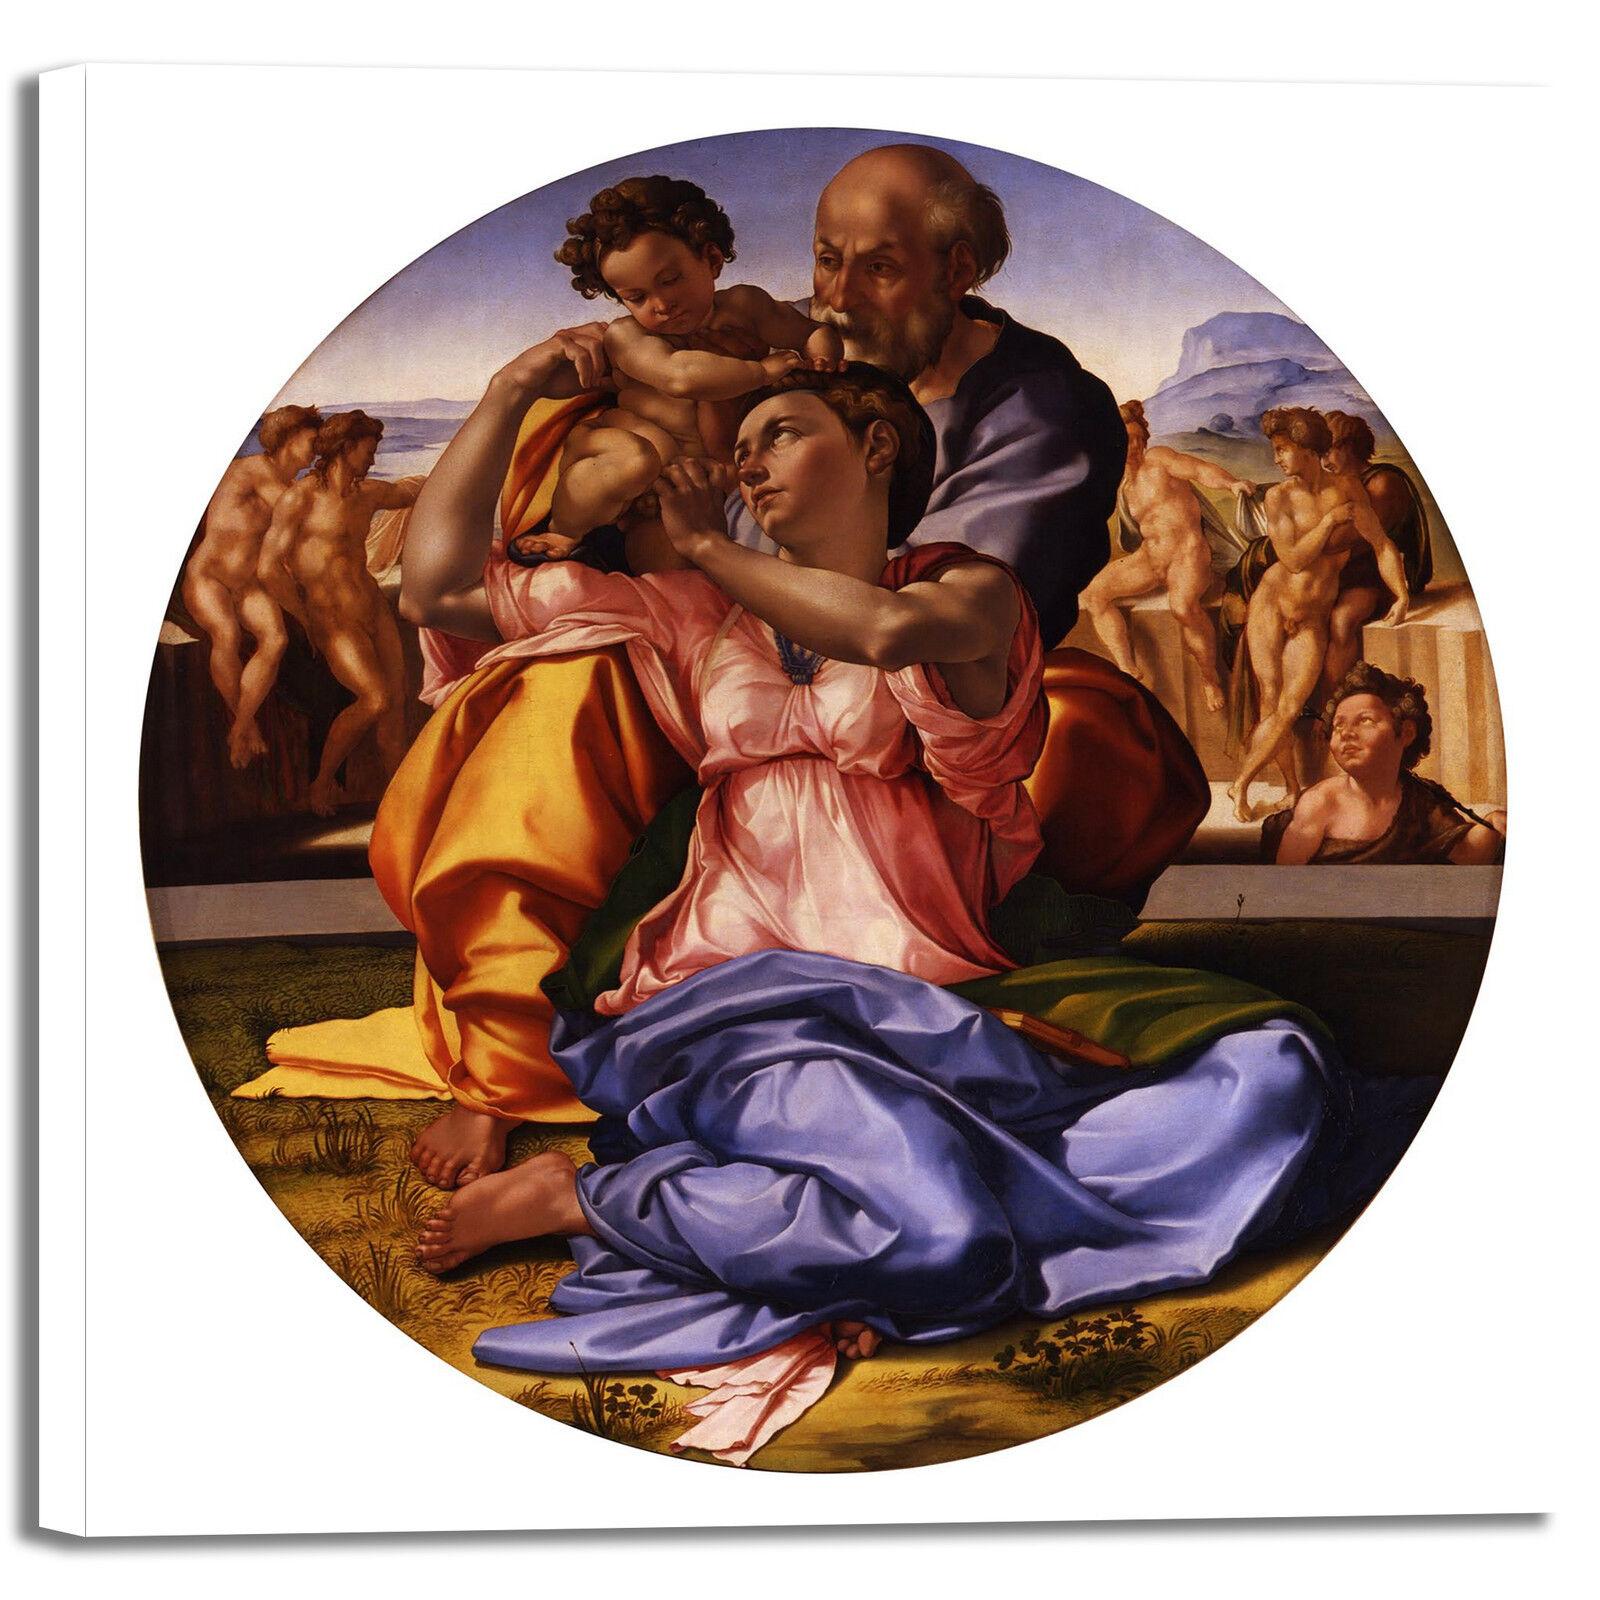 Michelangelo doni tondo design quadro stampa tela dipinto telaio arrossoo casa